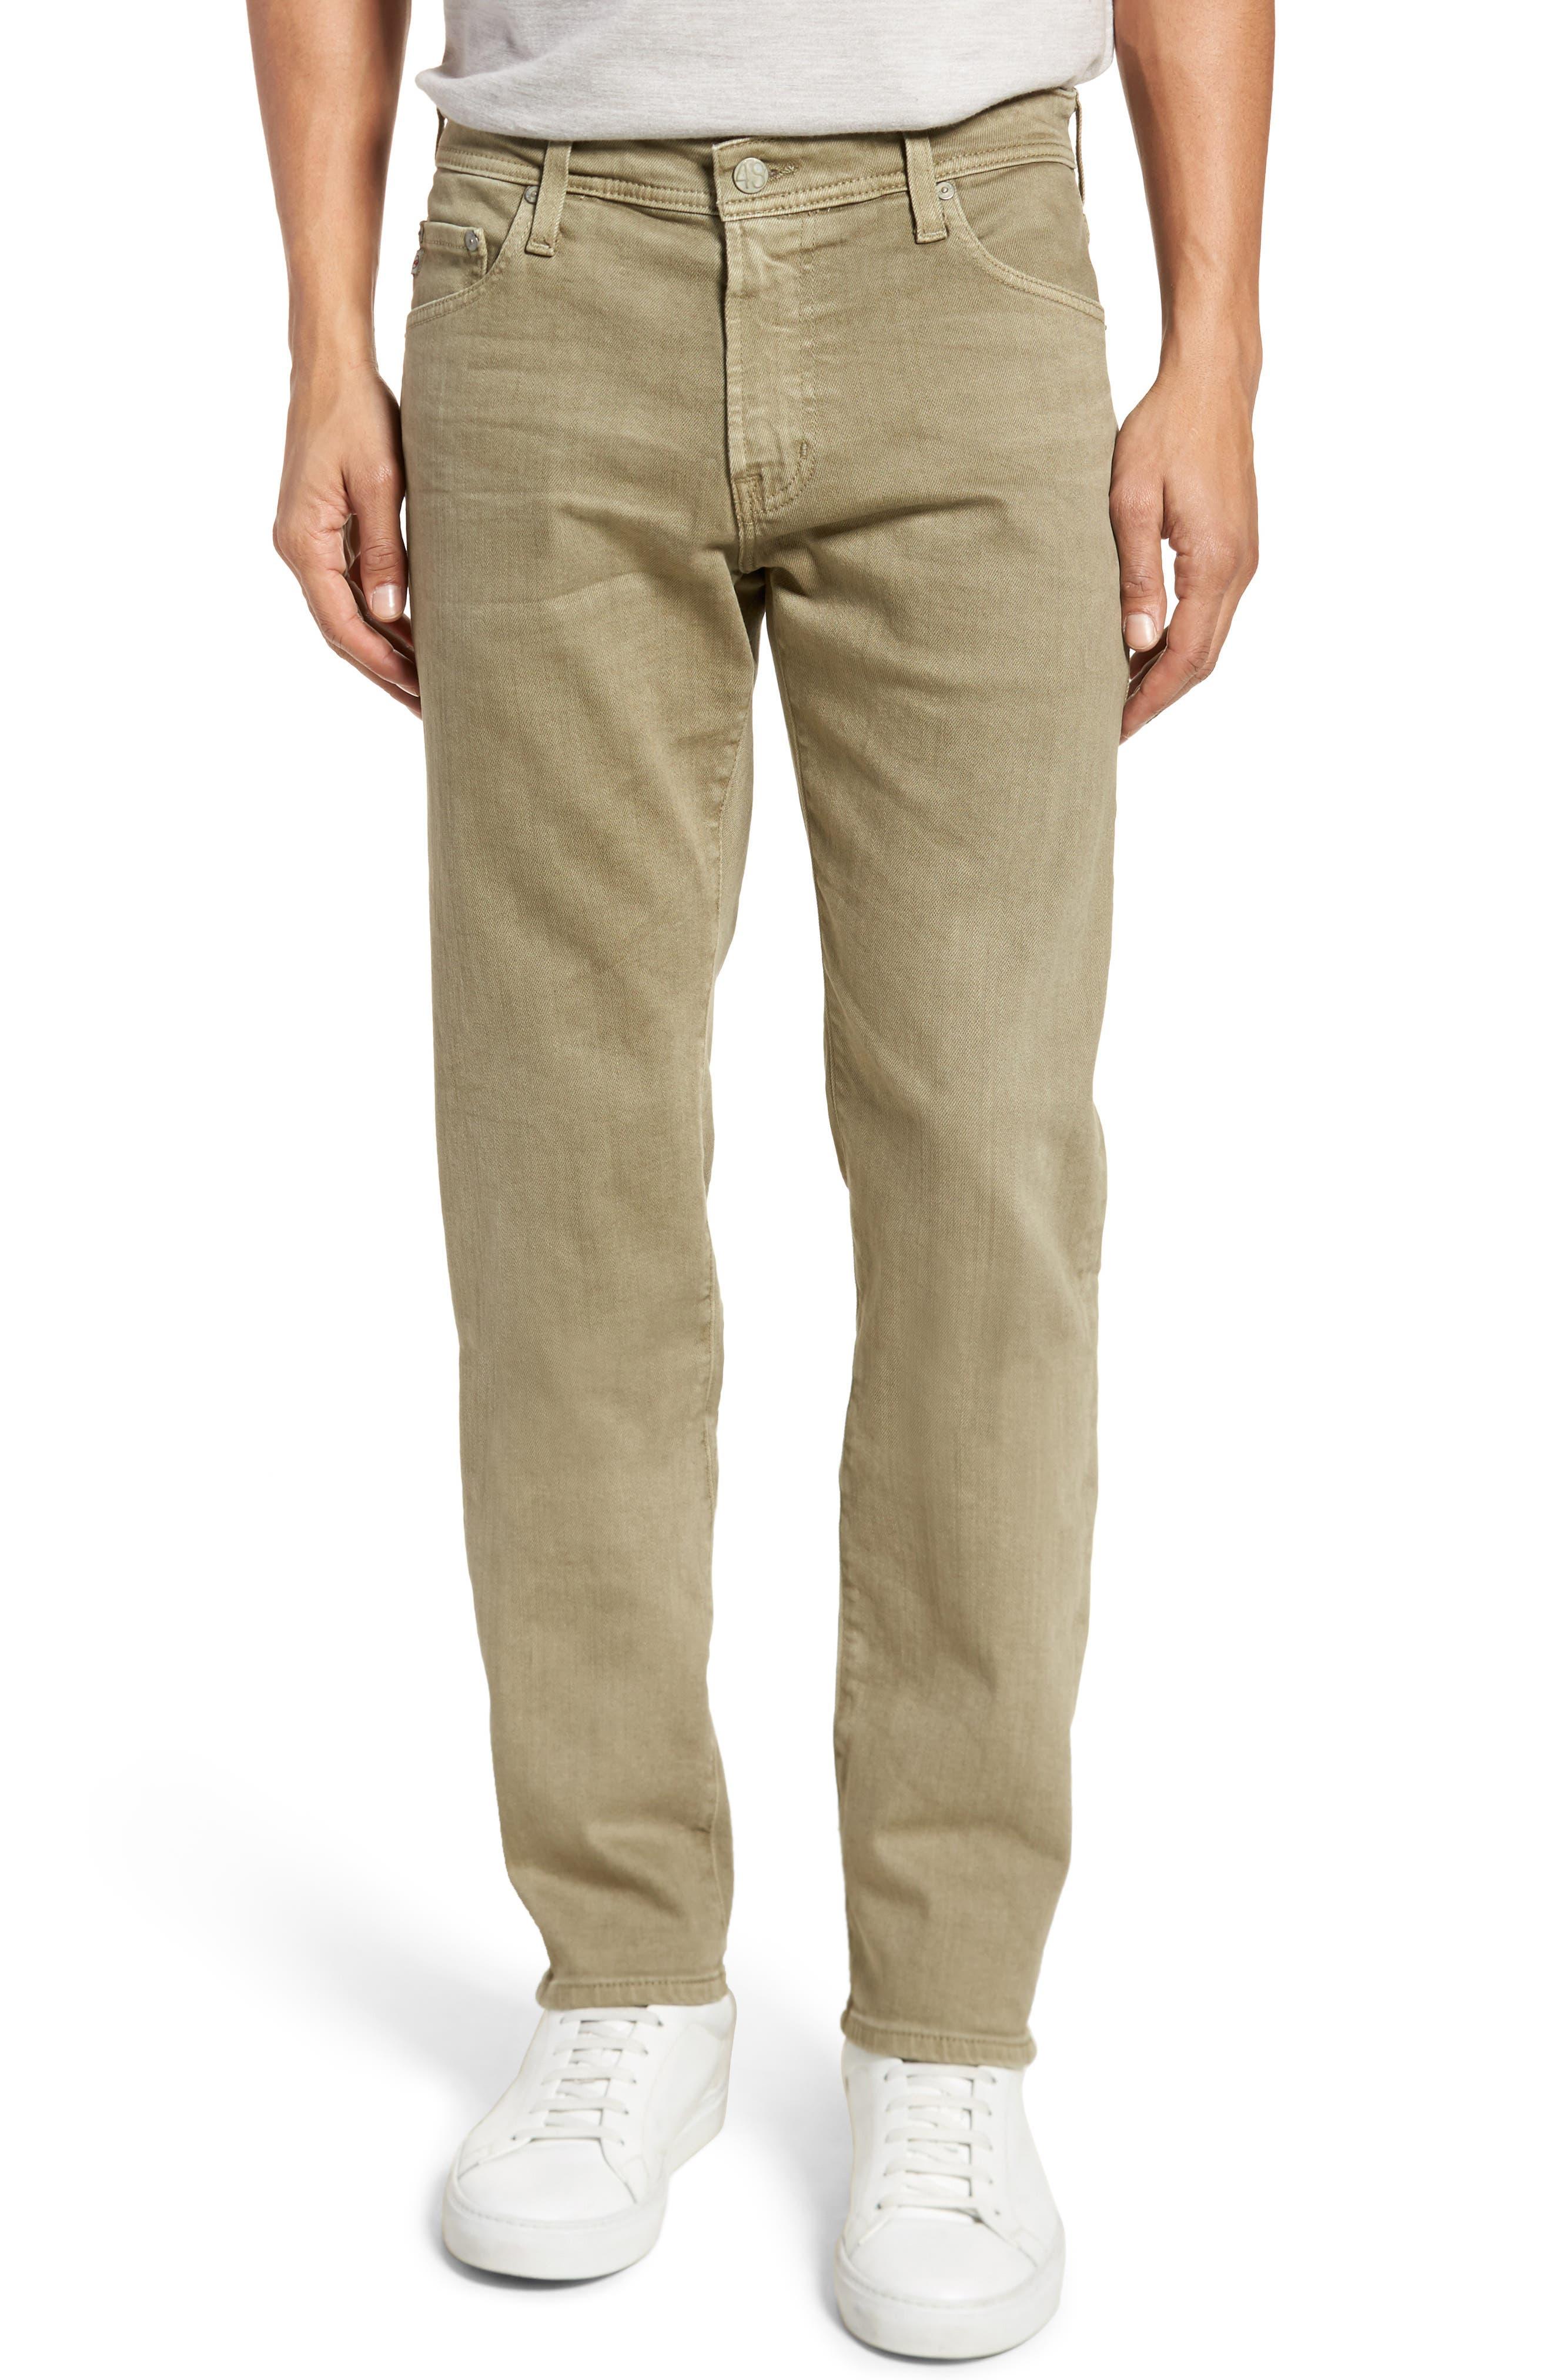 Alternate Image 1 Selected - AG Tellis Slim Fit Jeans (7 Years Dry Cypress)